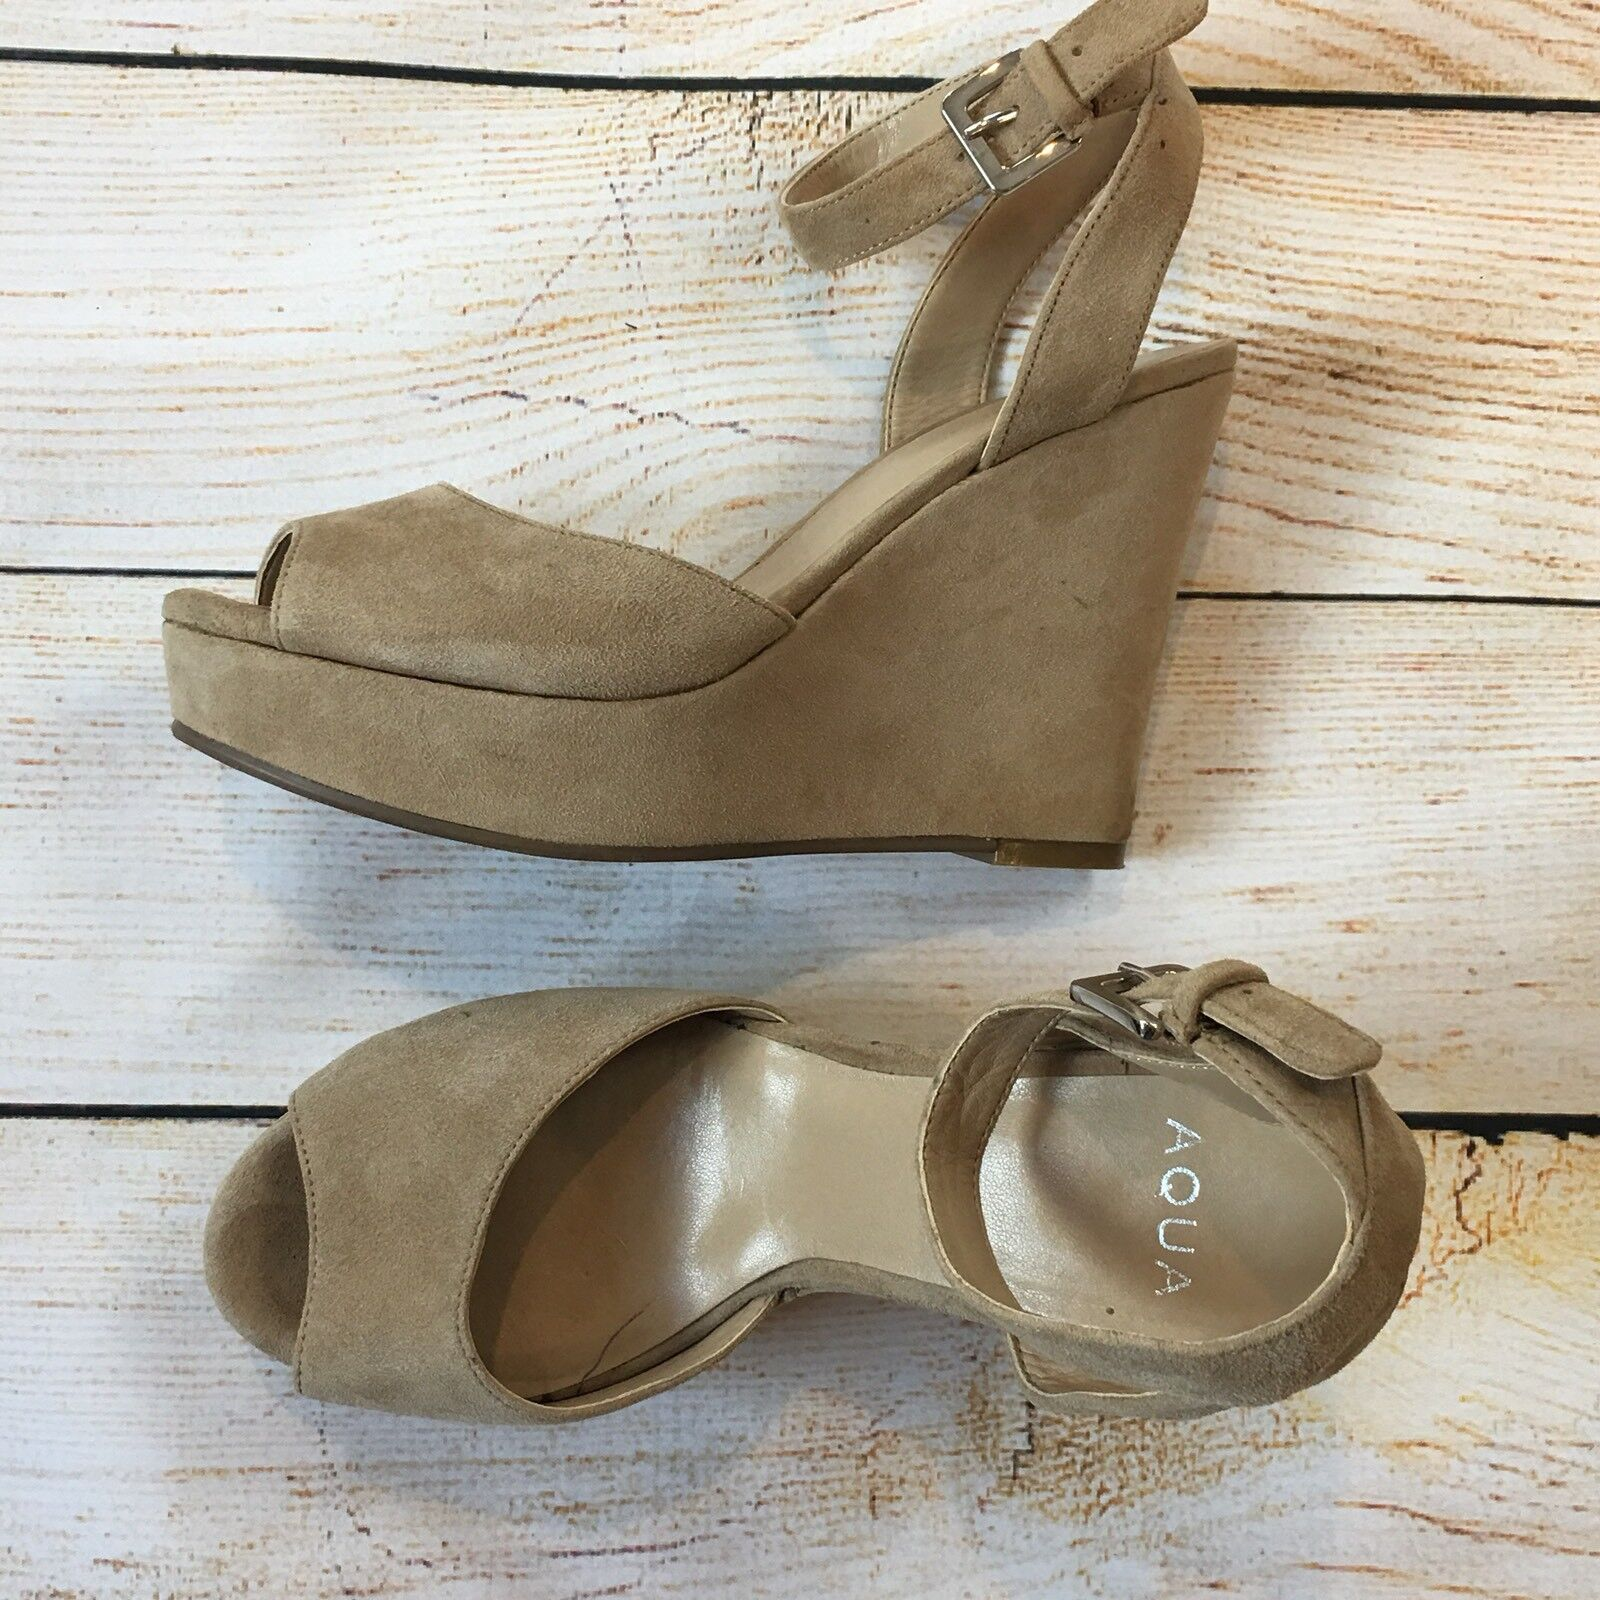 AQUA Light Beige Suede Wedges Sandals Ankle Strap Size 7 M